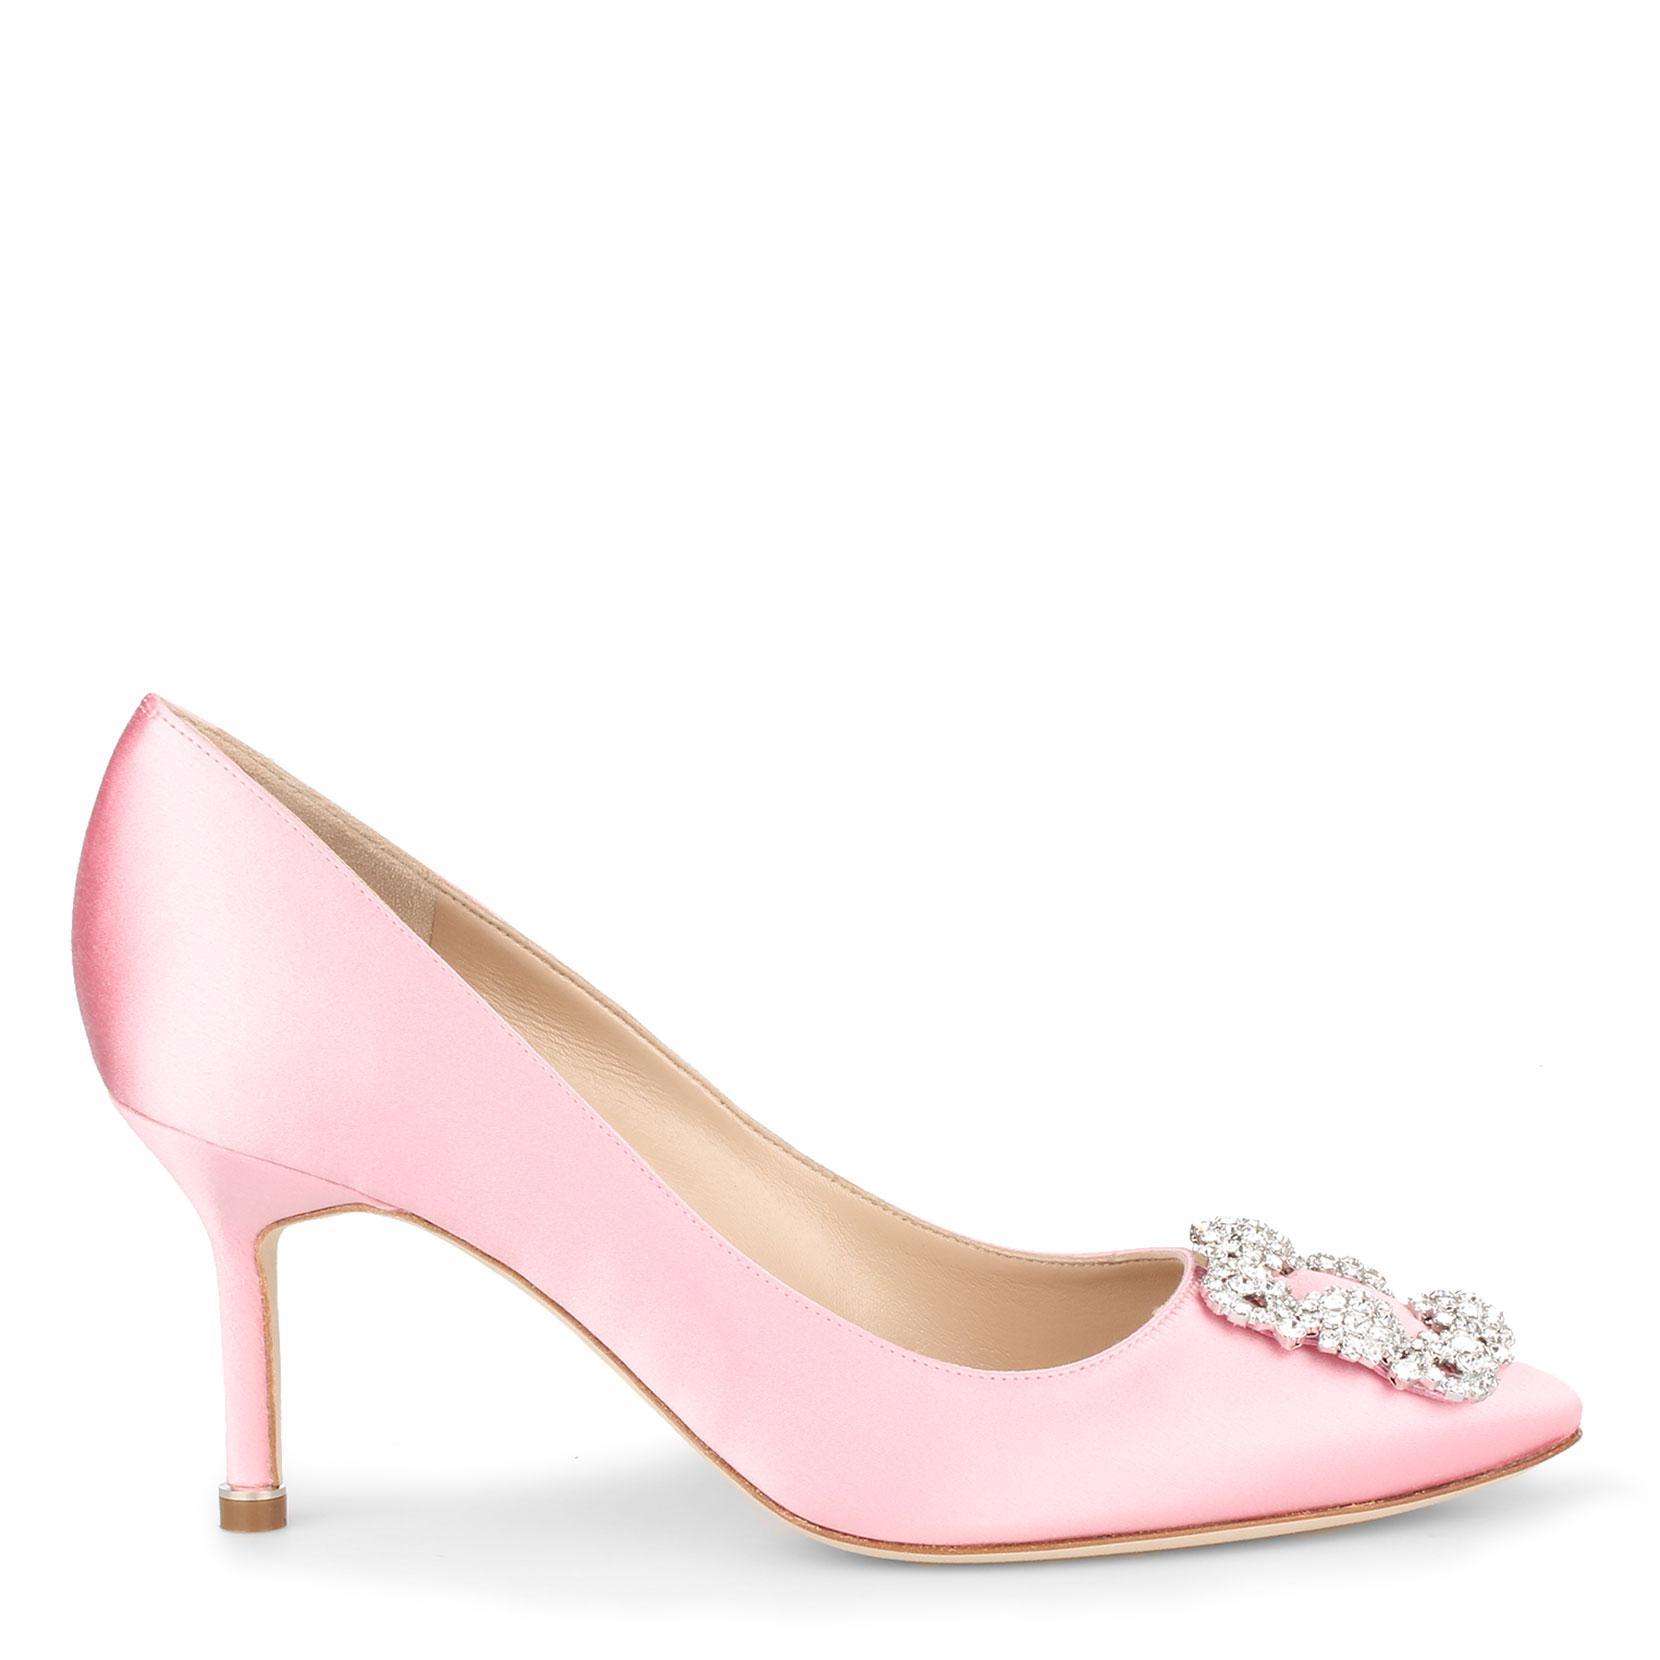 Hangisi 70 pink satin pump Manolo Blahnik zutiga